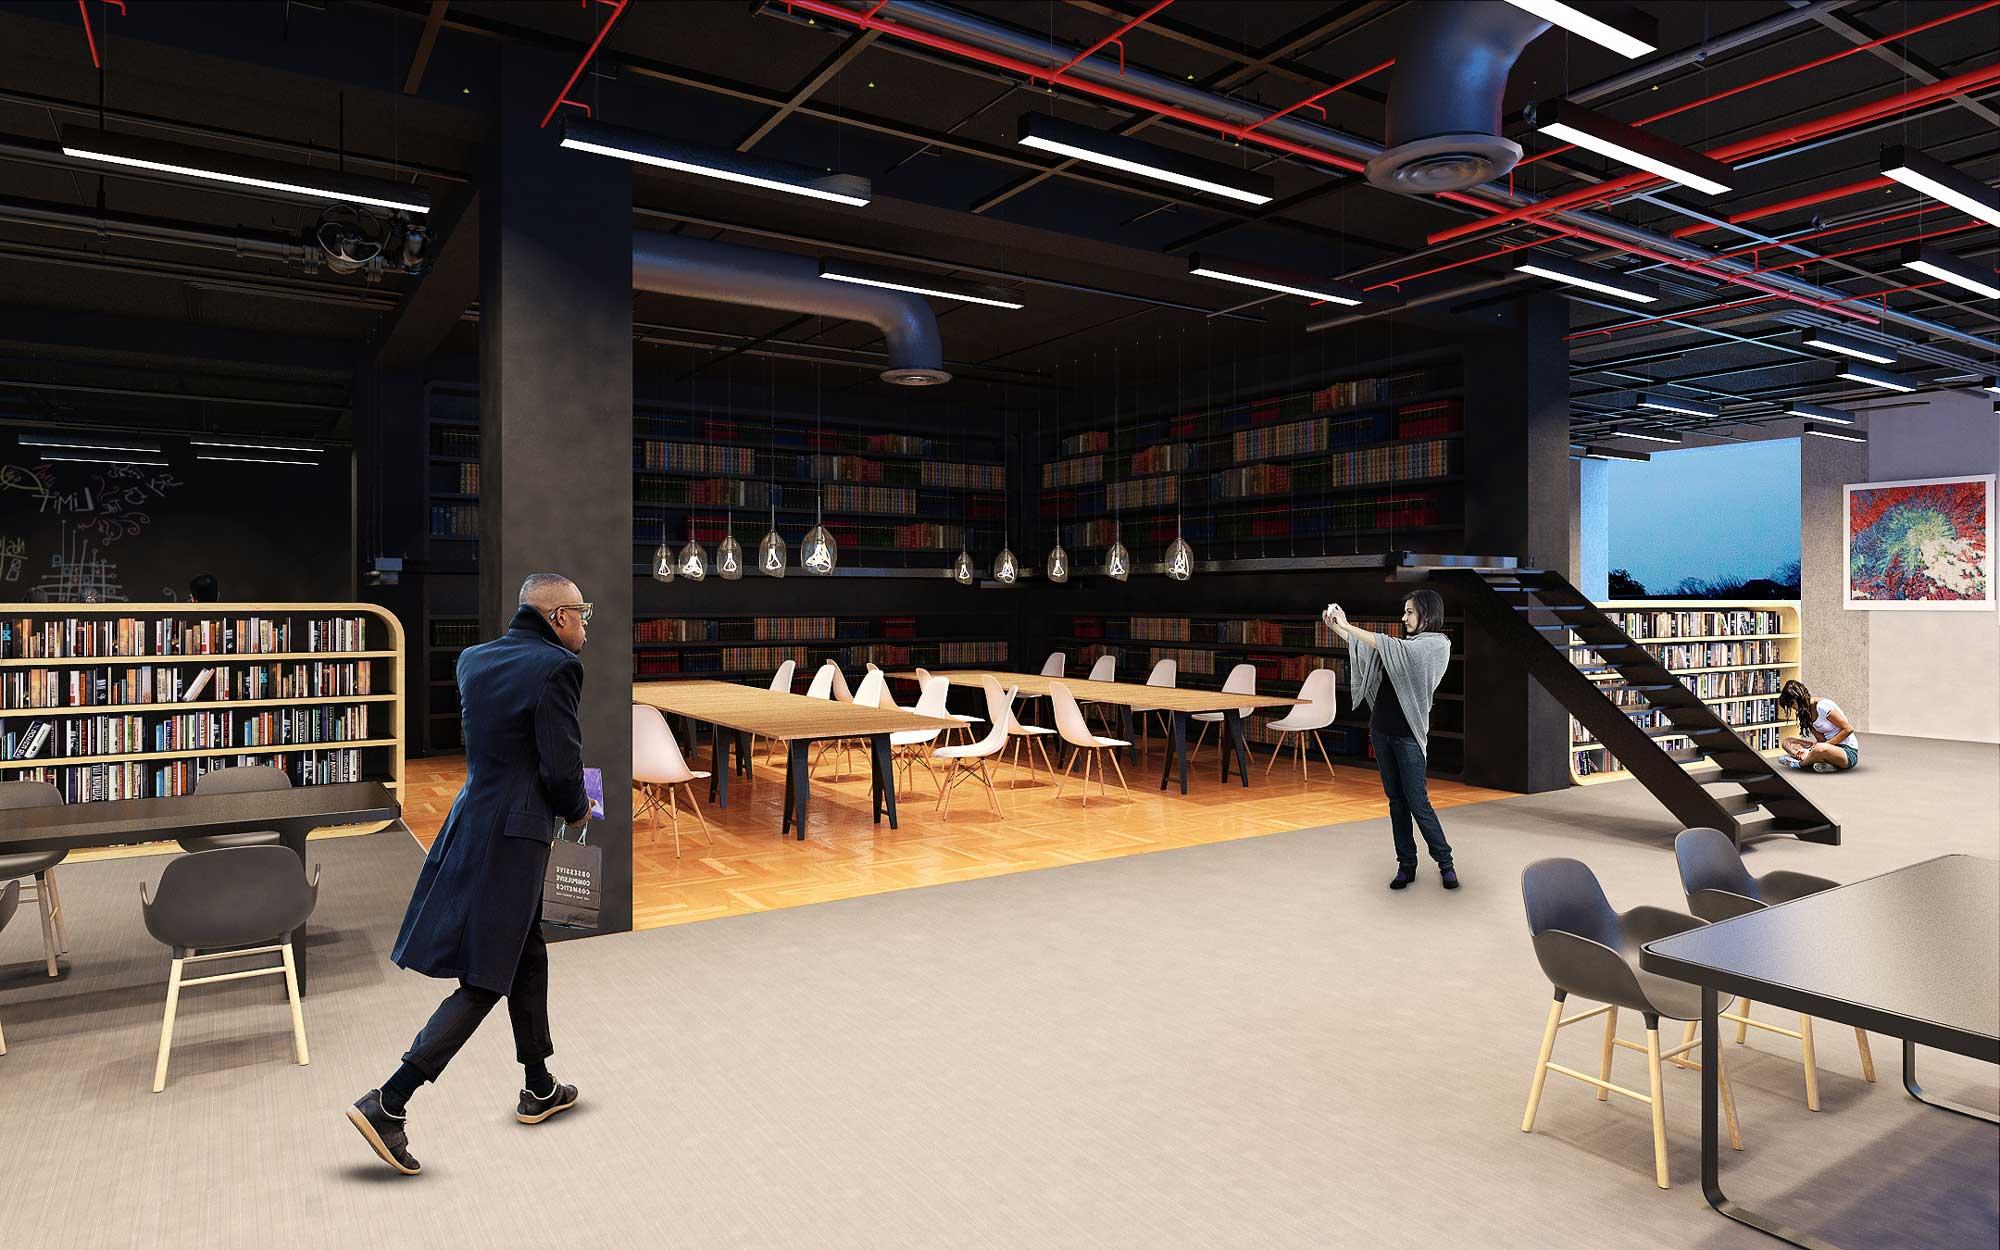 UDLAP Library Contest